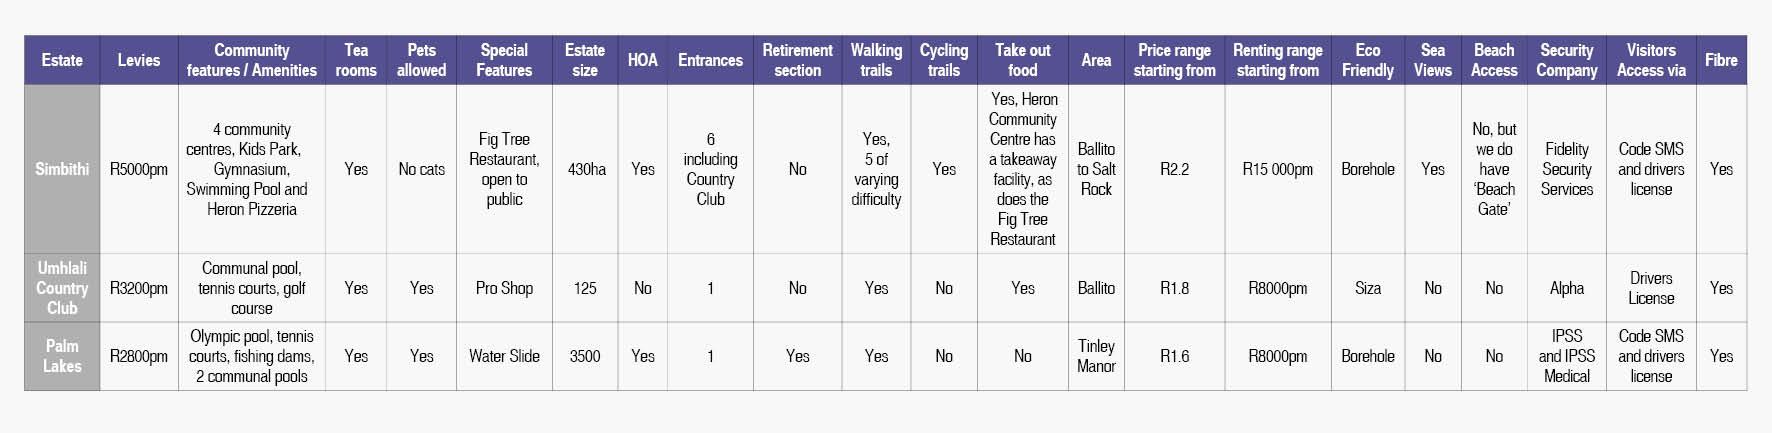 Estate Living Comparison Table